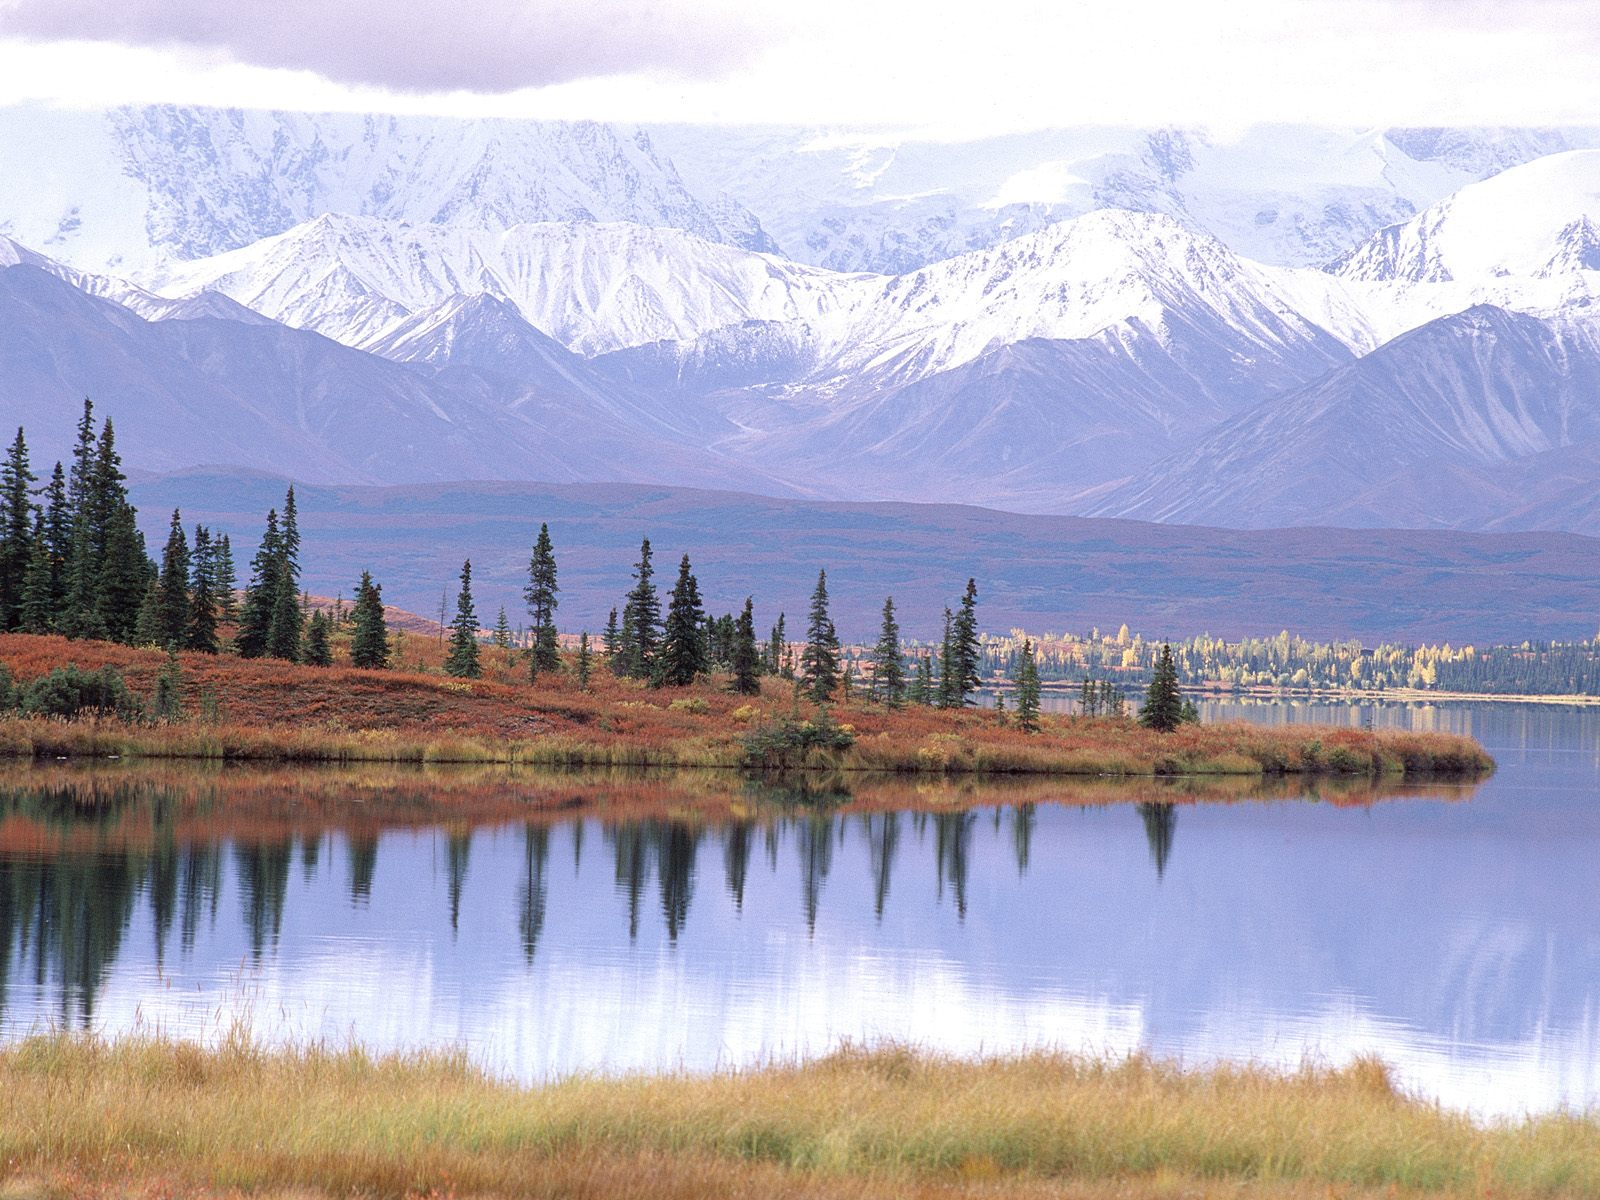 Les Lacs - Mount Tundra and Wonder Lake, Denali National Park, Alaska ...